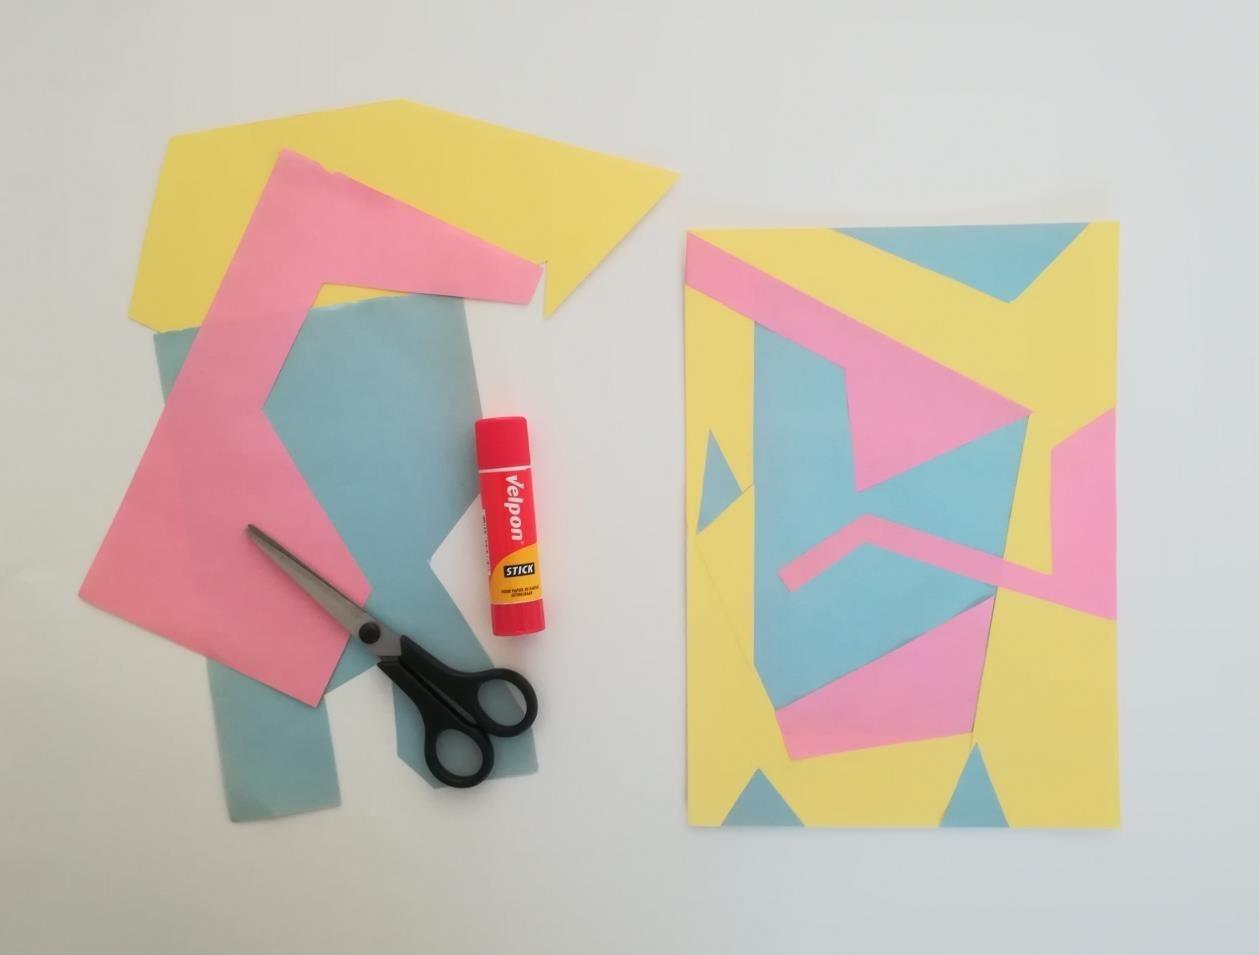 Kinderworkshop Mondriaanhuis - Papier mozaïek